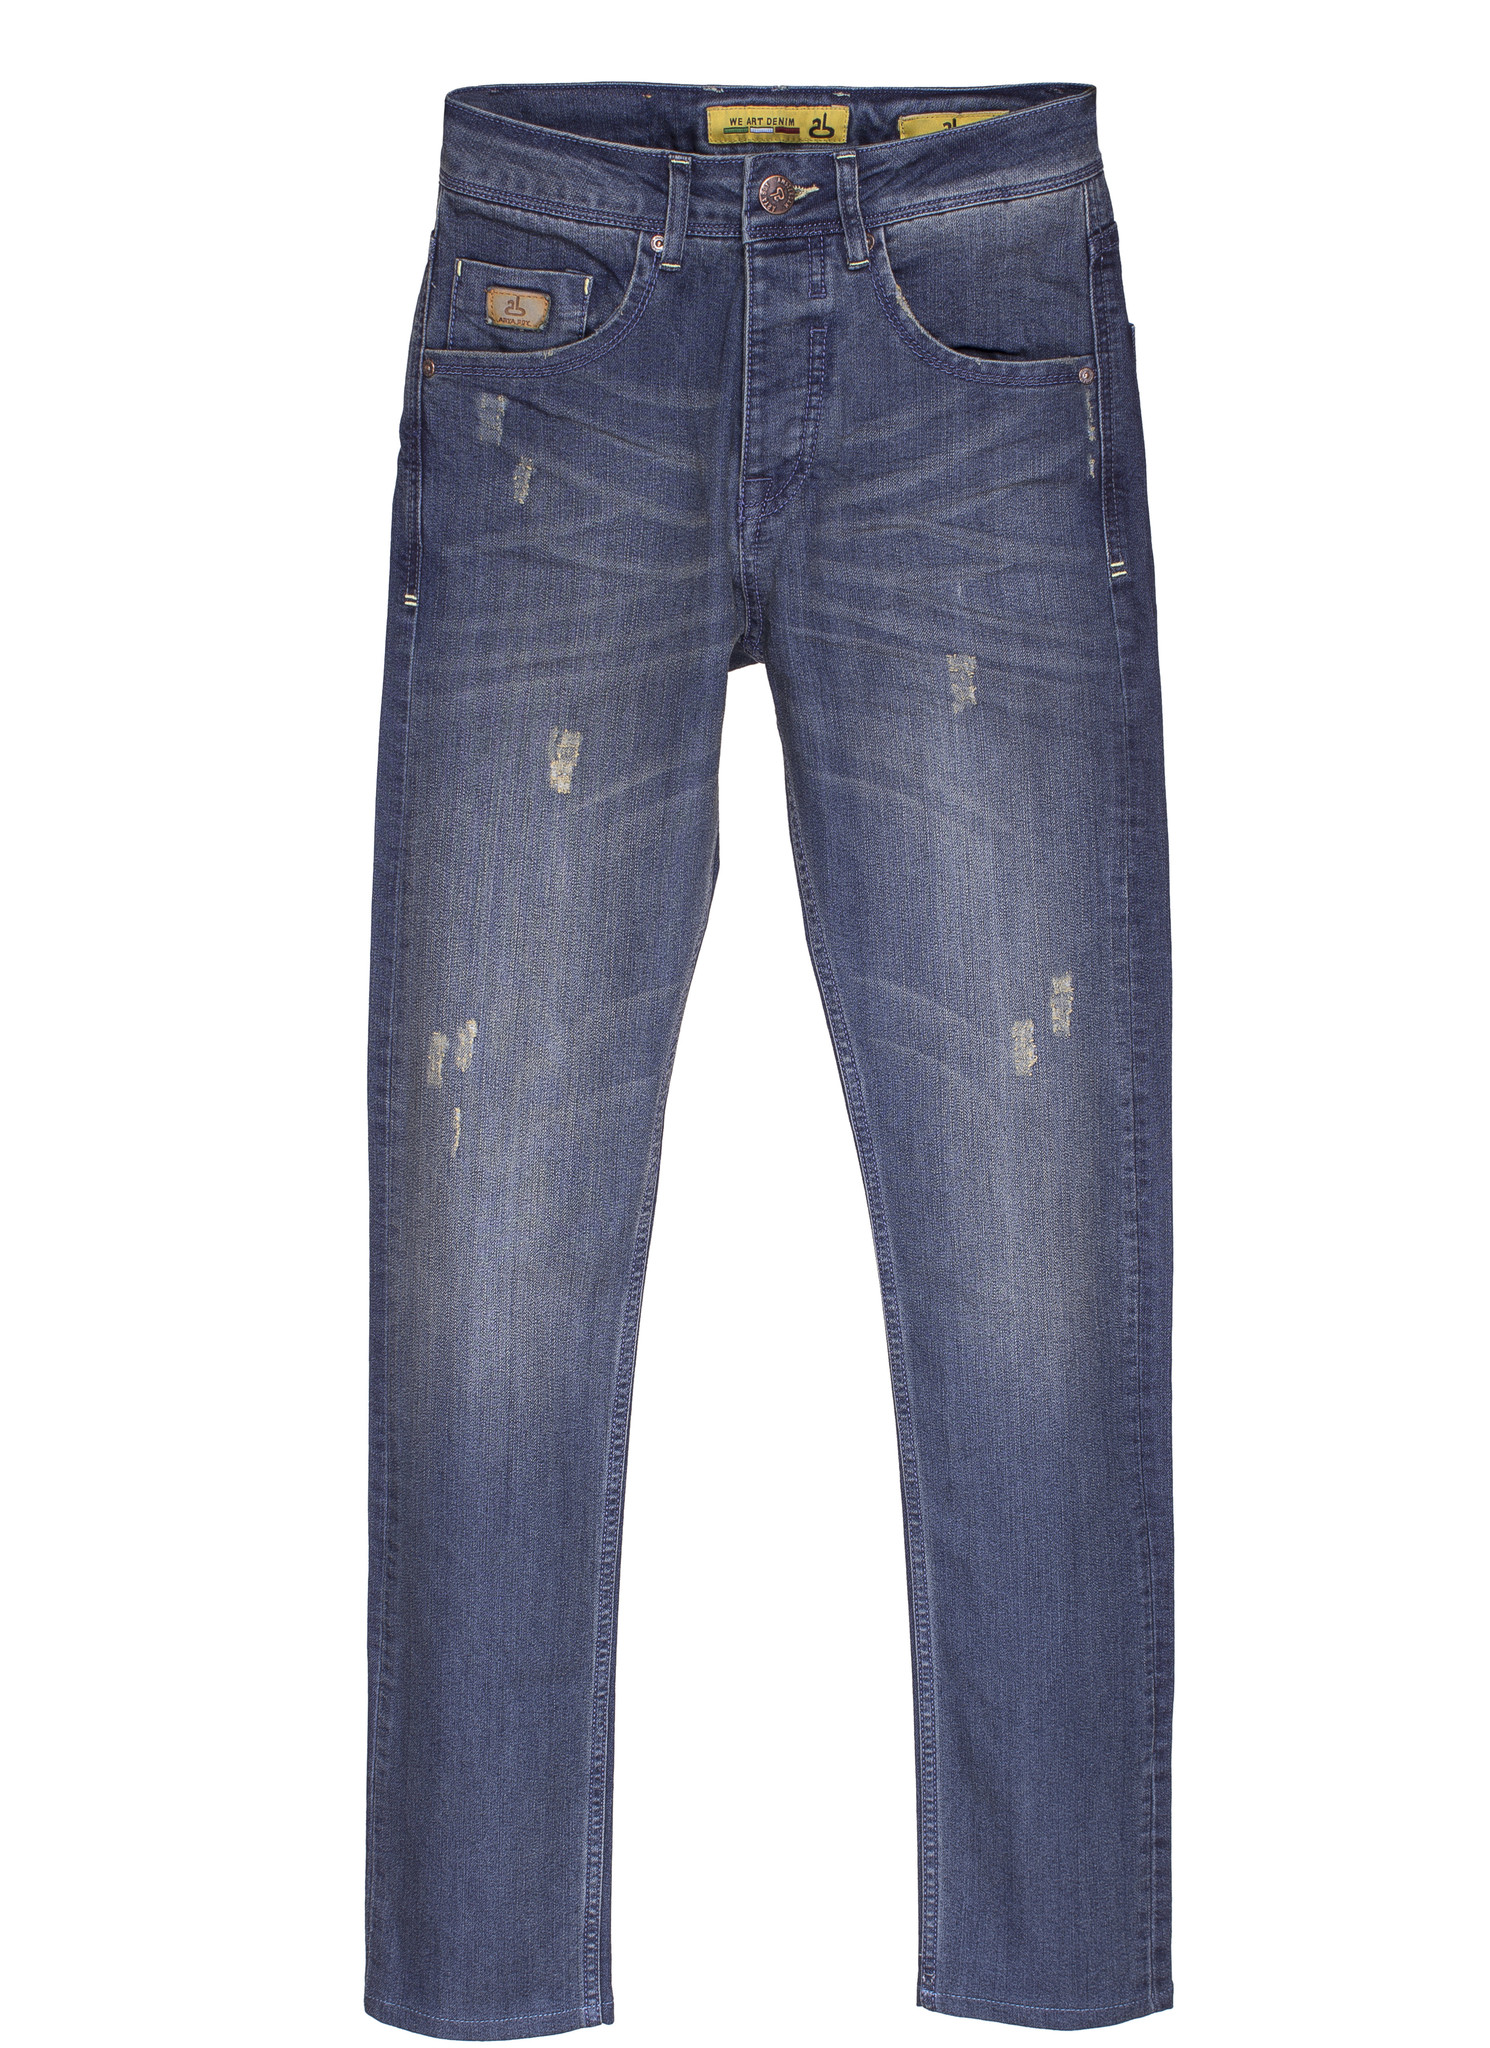 Arya Boy Jeans 82042 Dark Blue